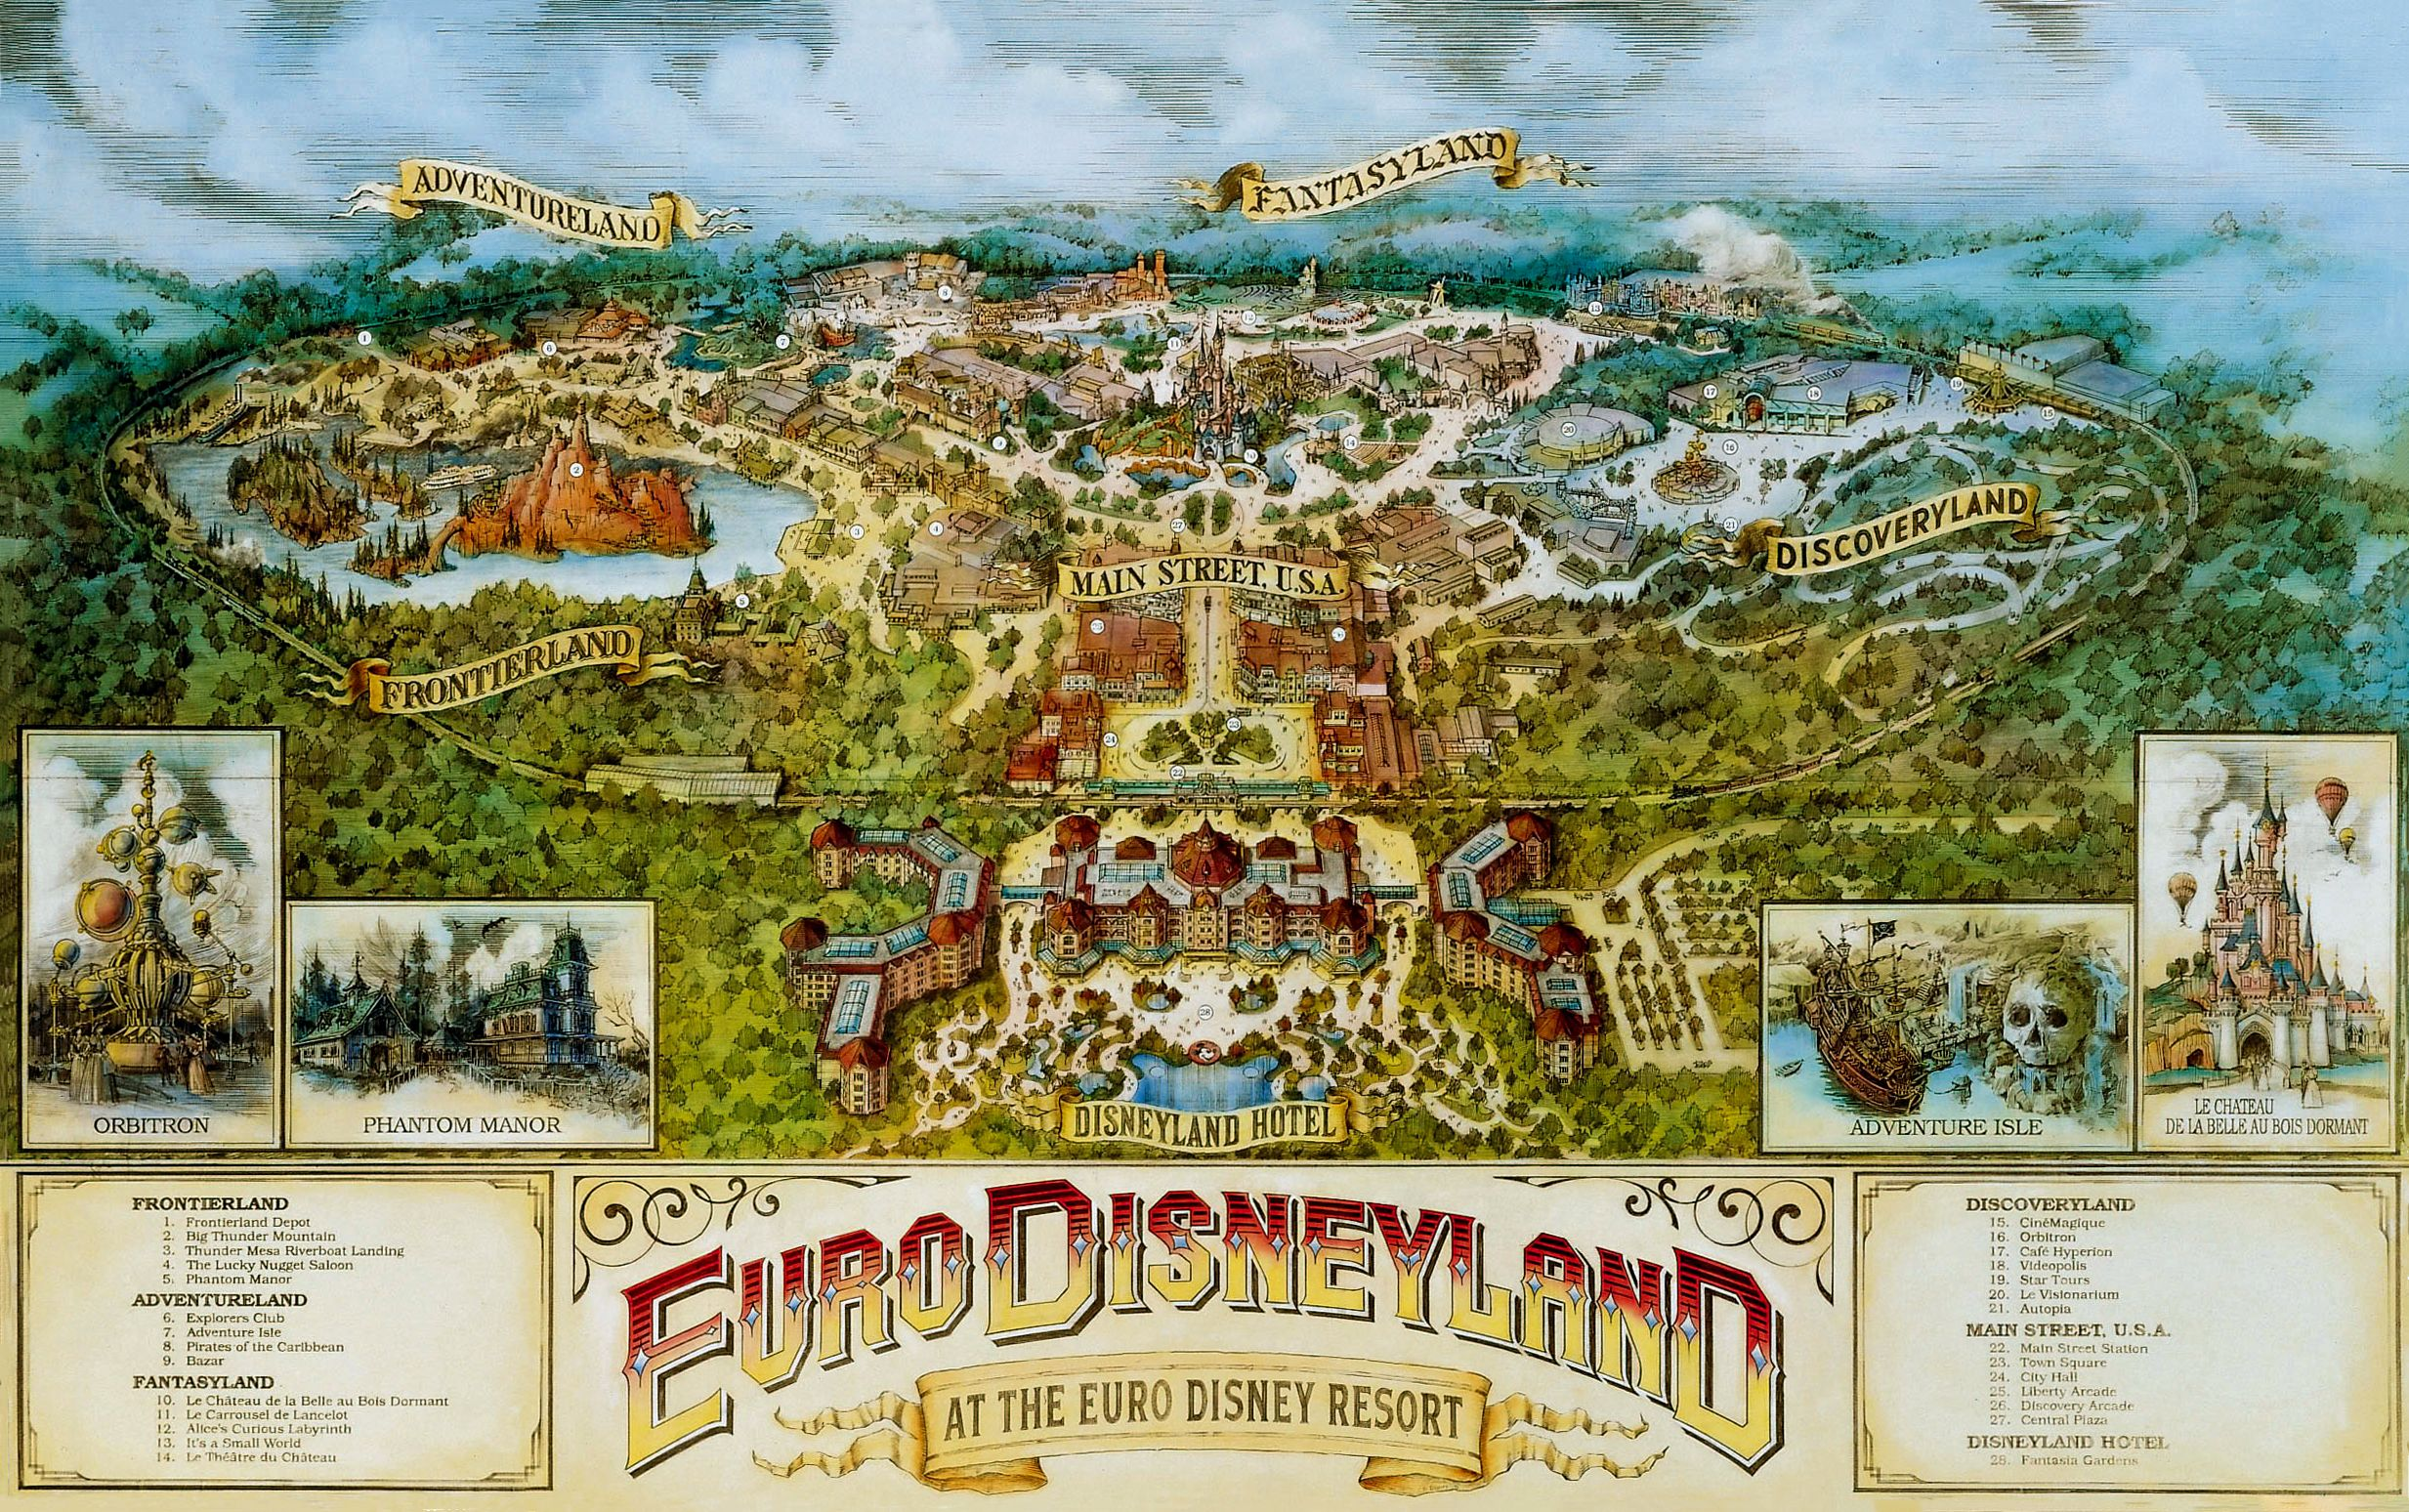 Early Concept Design For Eurodisneyland Now Disneyland Paris Disneyland Paris Disneyland Disney Paris